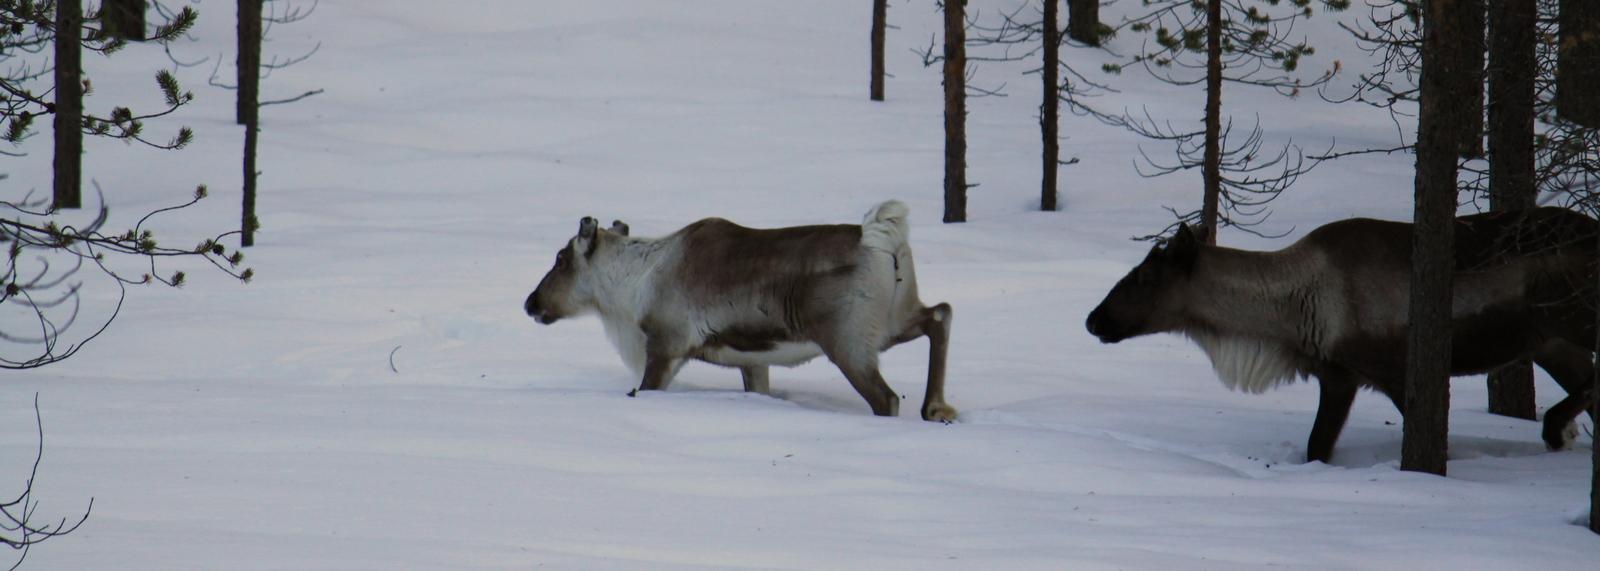 Reindeer, Ivalo